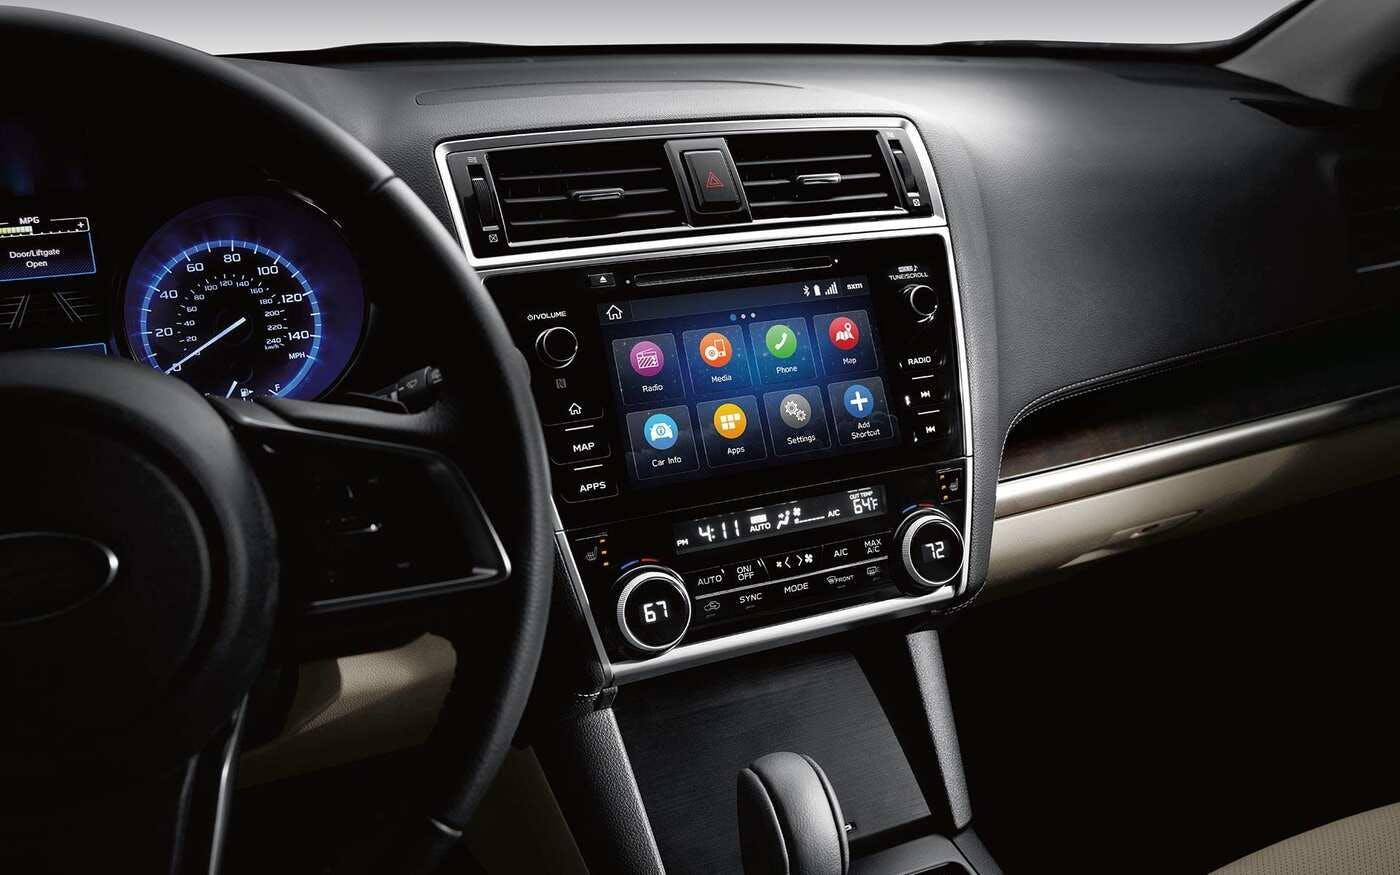 2019 Subaru Outback Comparisons, Reviews & Pictures   TrueCar